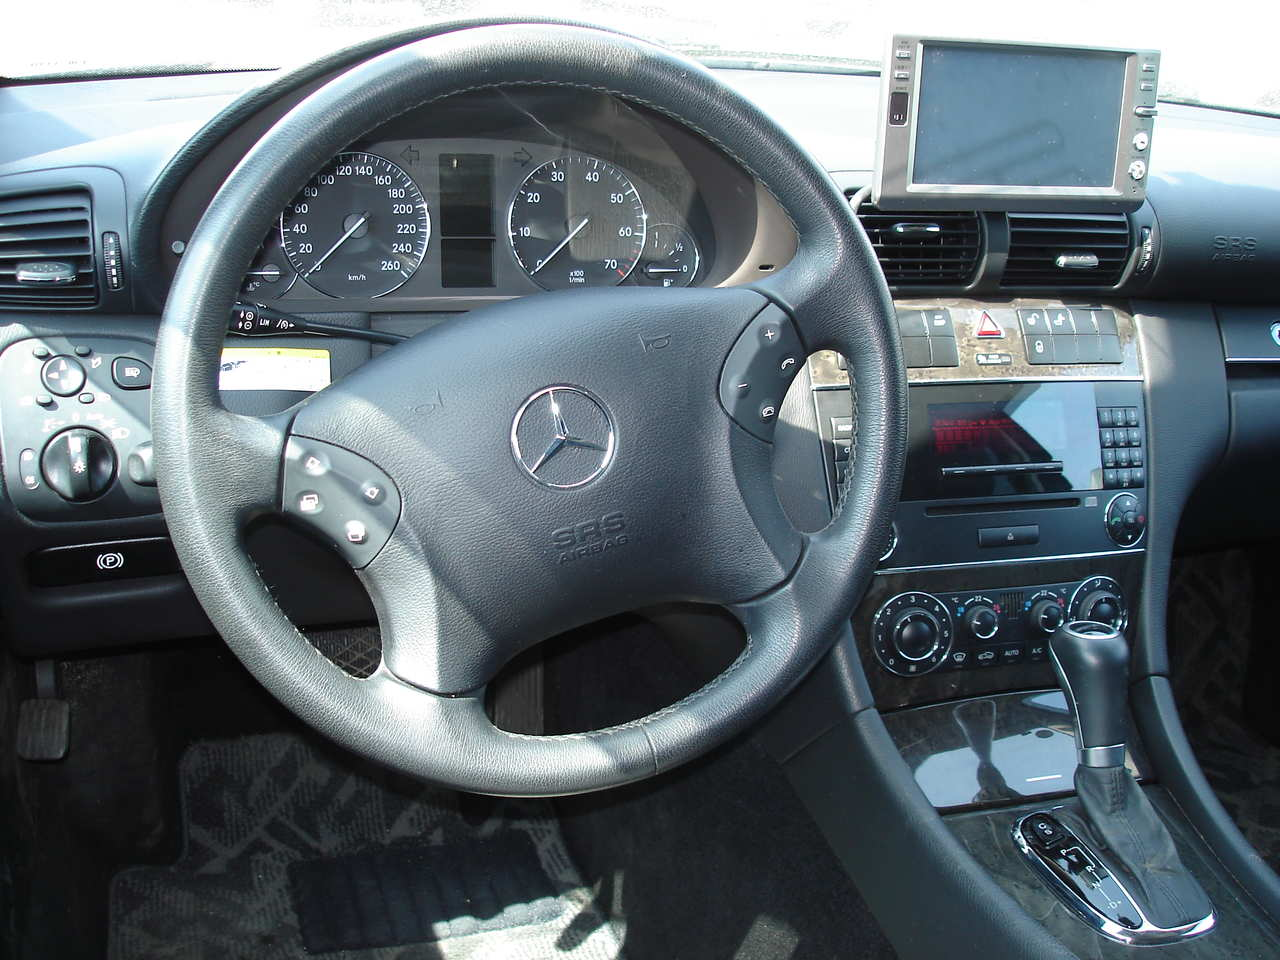 Mb Sprinter Interior >> 2006 MERCEDES-BENZ C-CLASS - Image #12